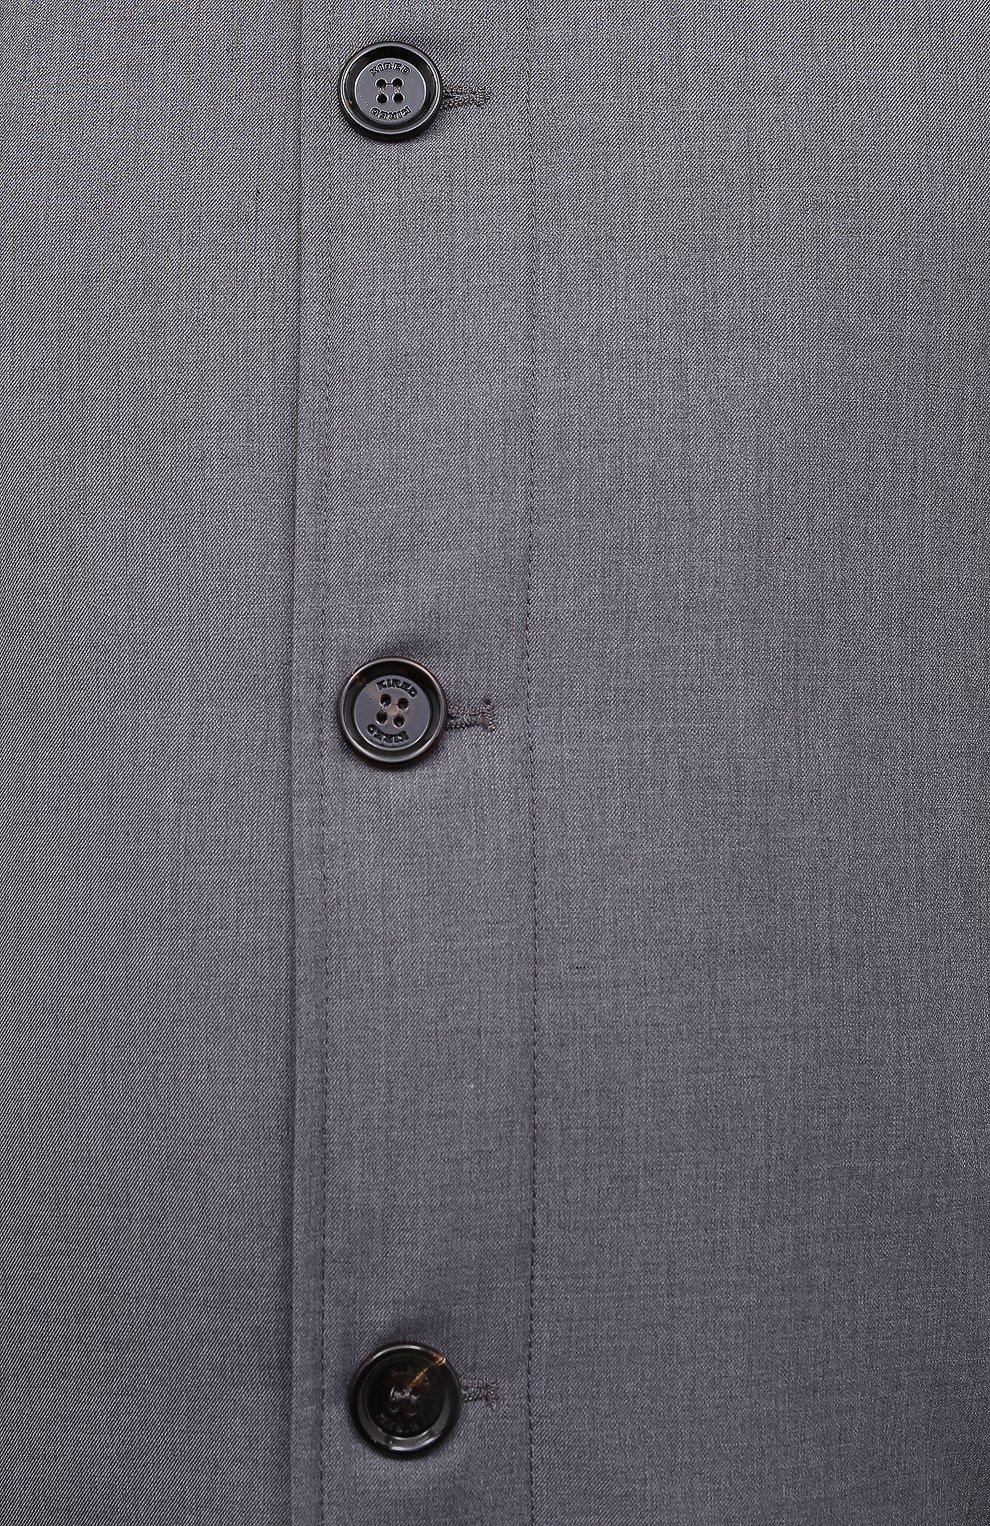 Мужской утепленный плащ KIRED серого цвета, арт. WP0RDW7200001001/62-72 | Фото 5